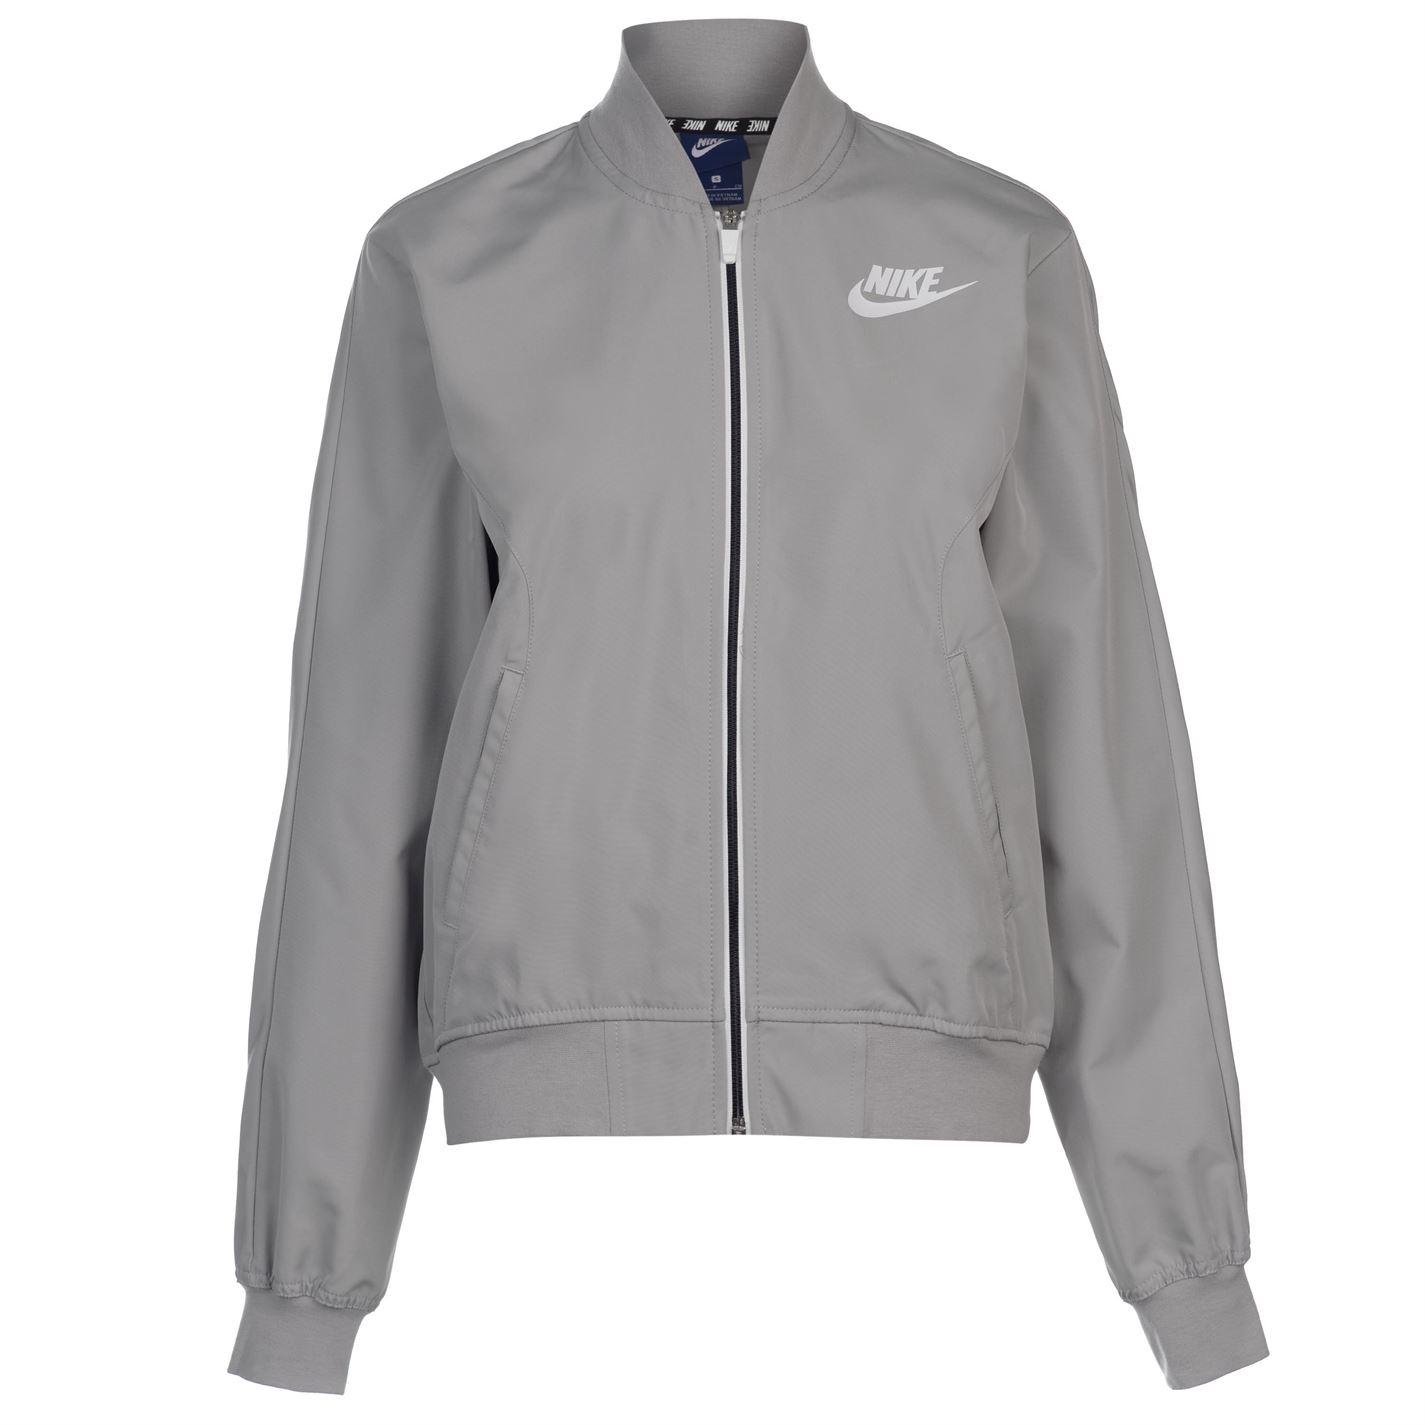 Nike AV15 Woven Jacket Ladies